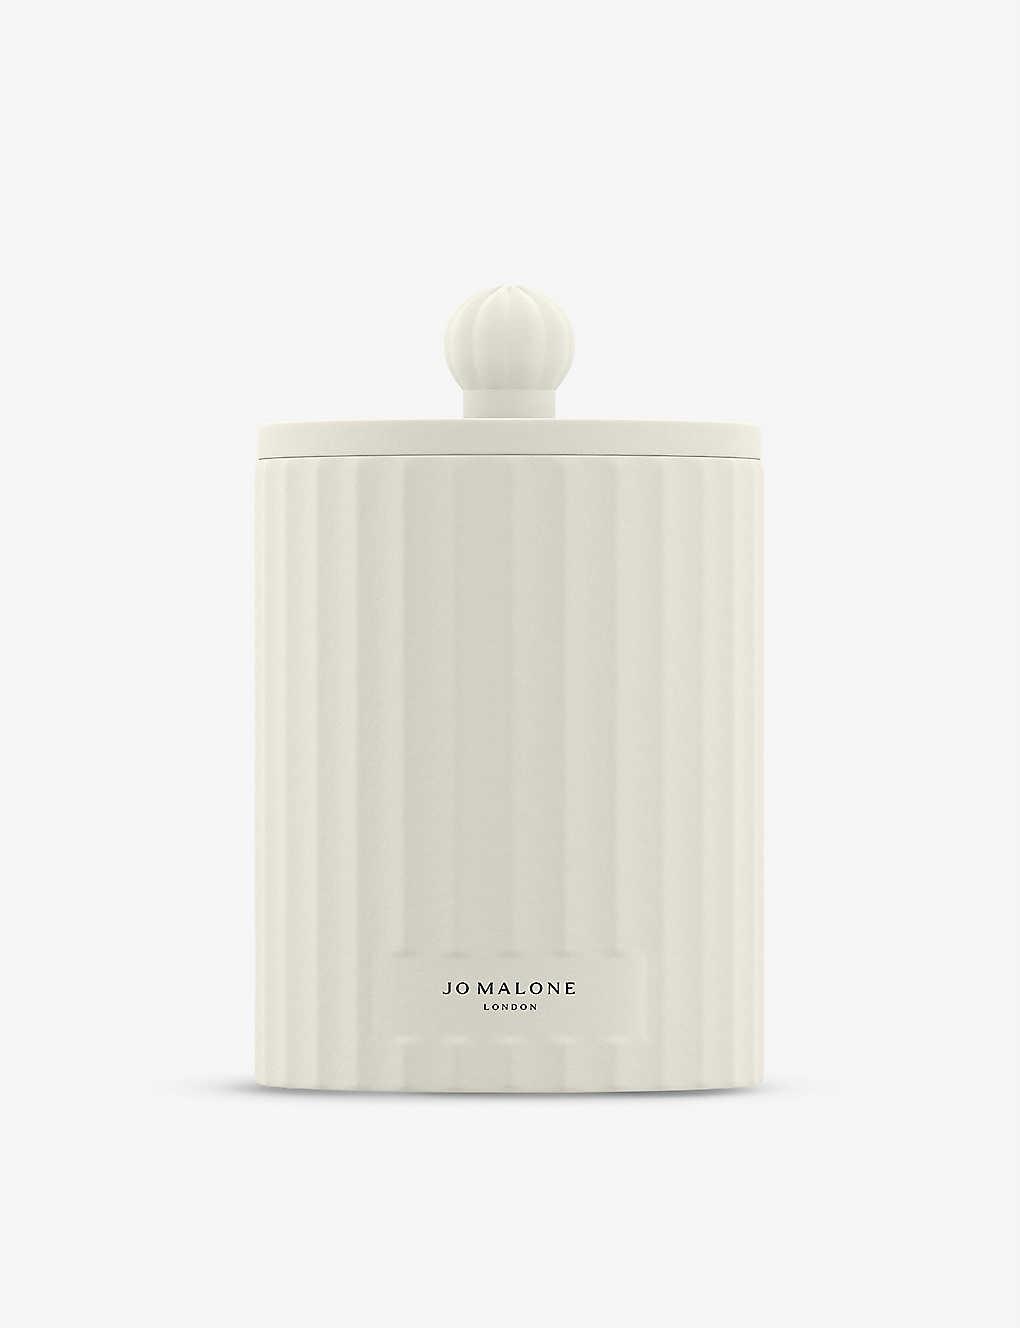 JO MALONE LONDON: Wild Berry & Bramble scented candle 300g